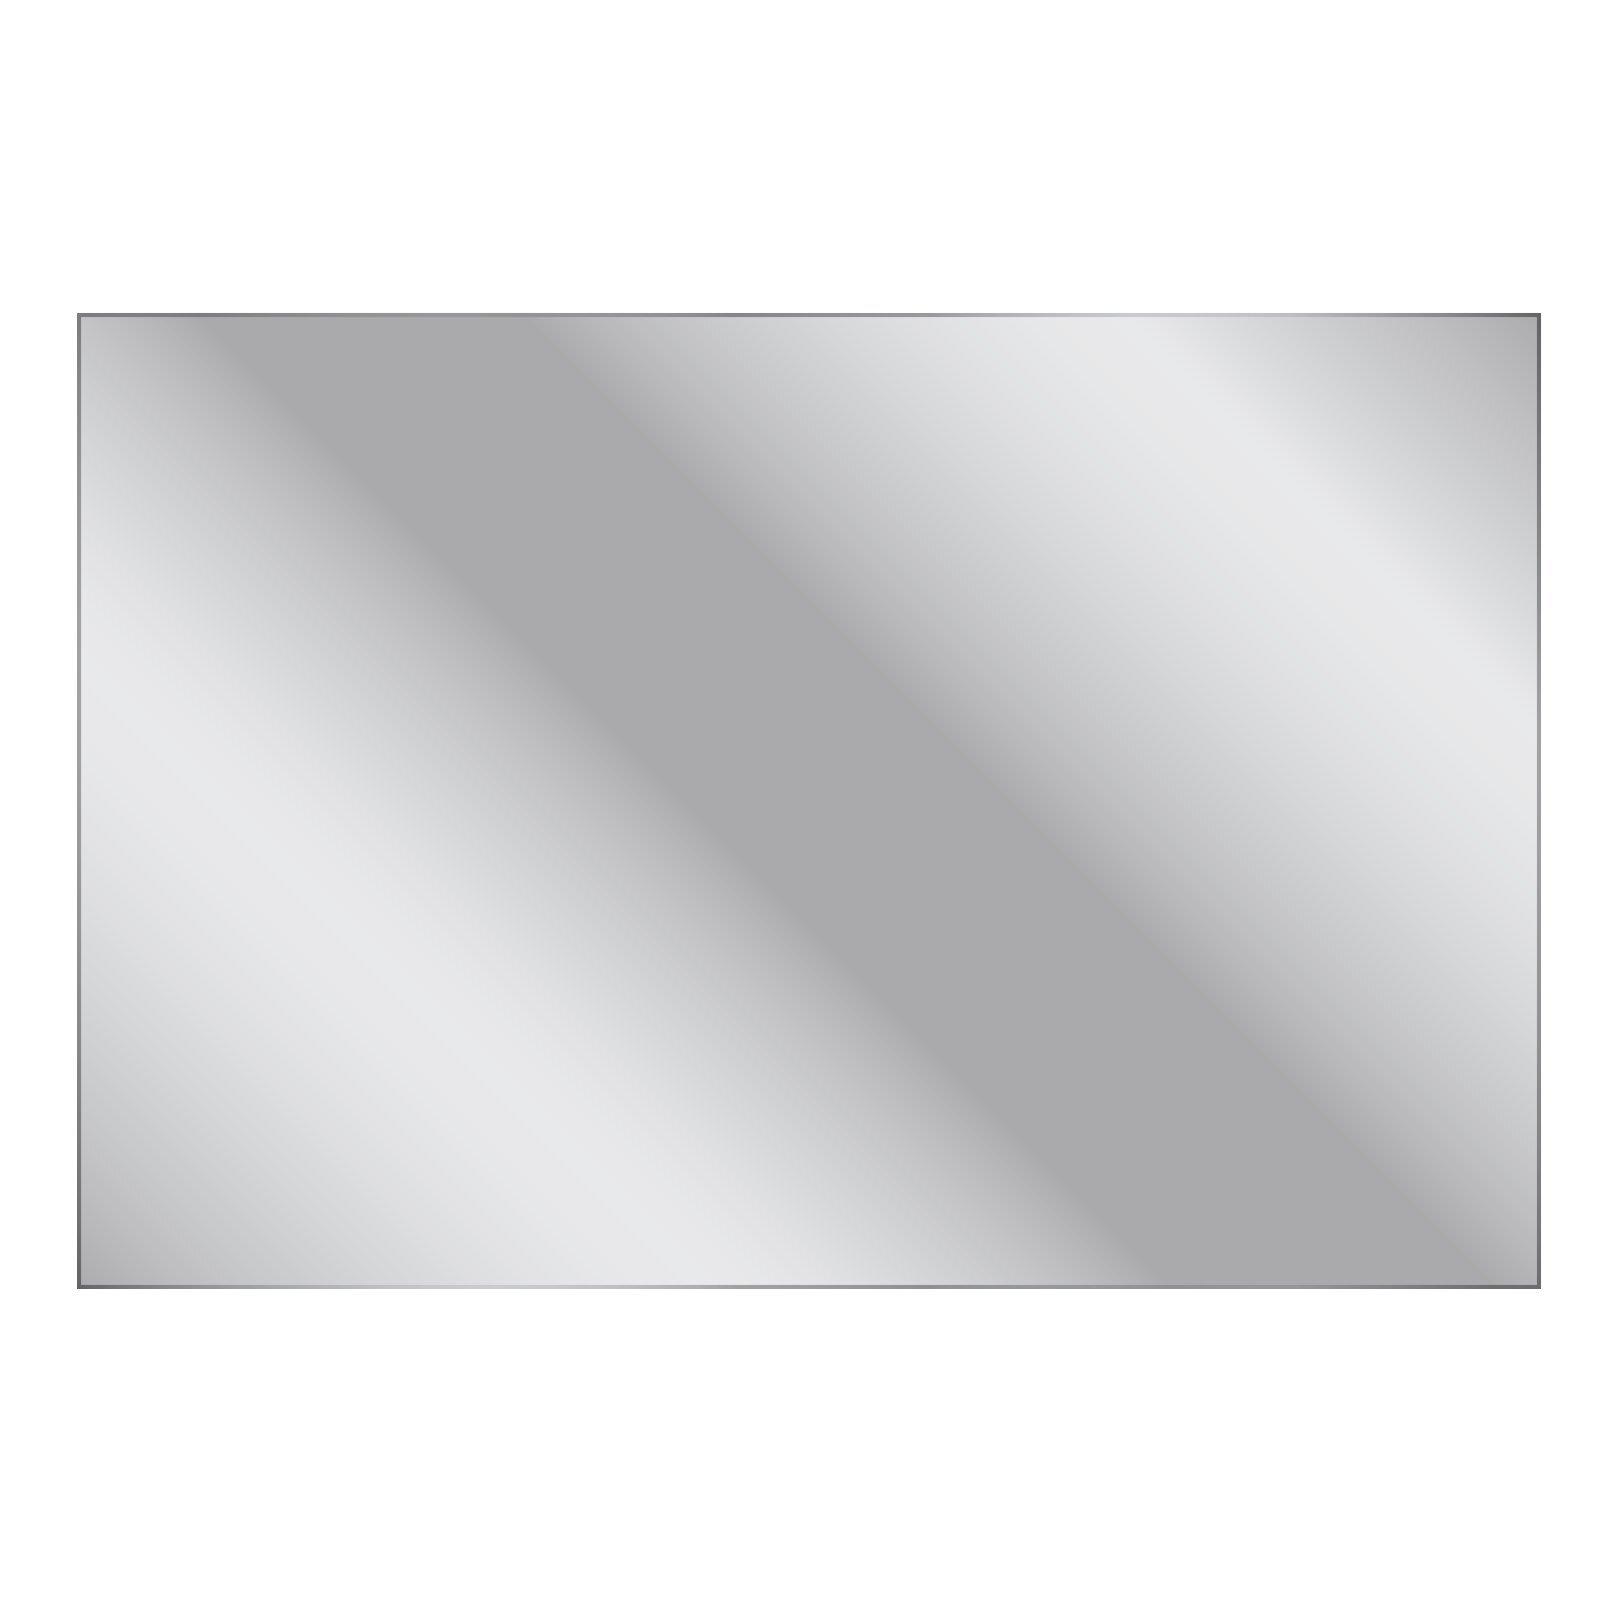 Living Elements 600 x 900 x 5mm Flat Edge Mirror